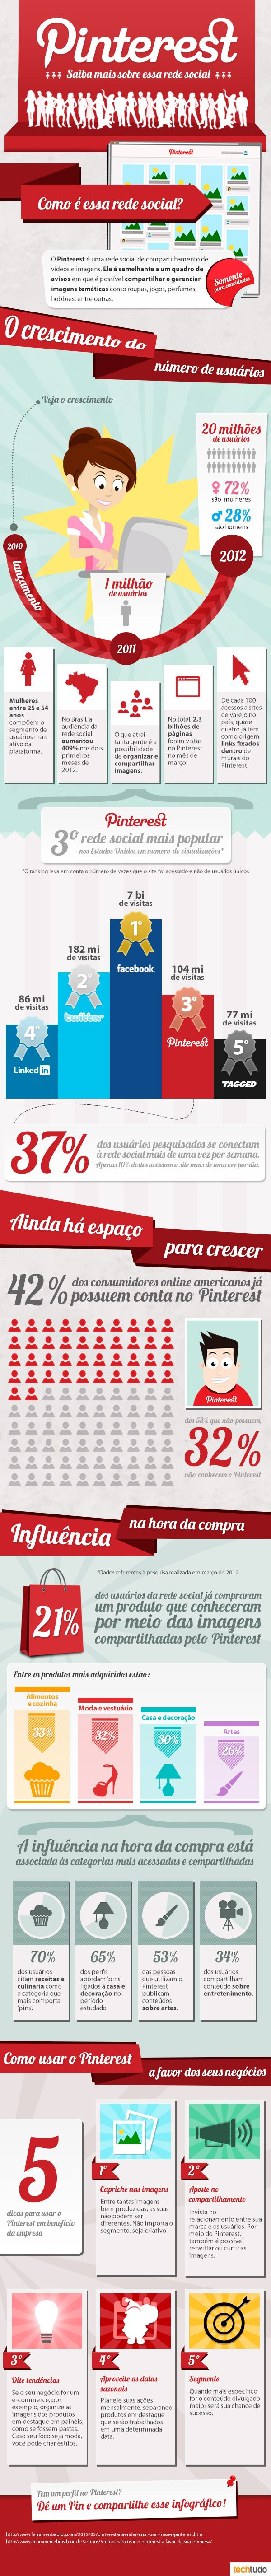 Números da rede social Pinterest (Foto: TechTudo)